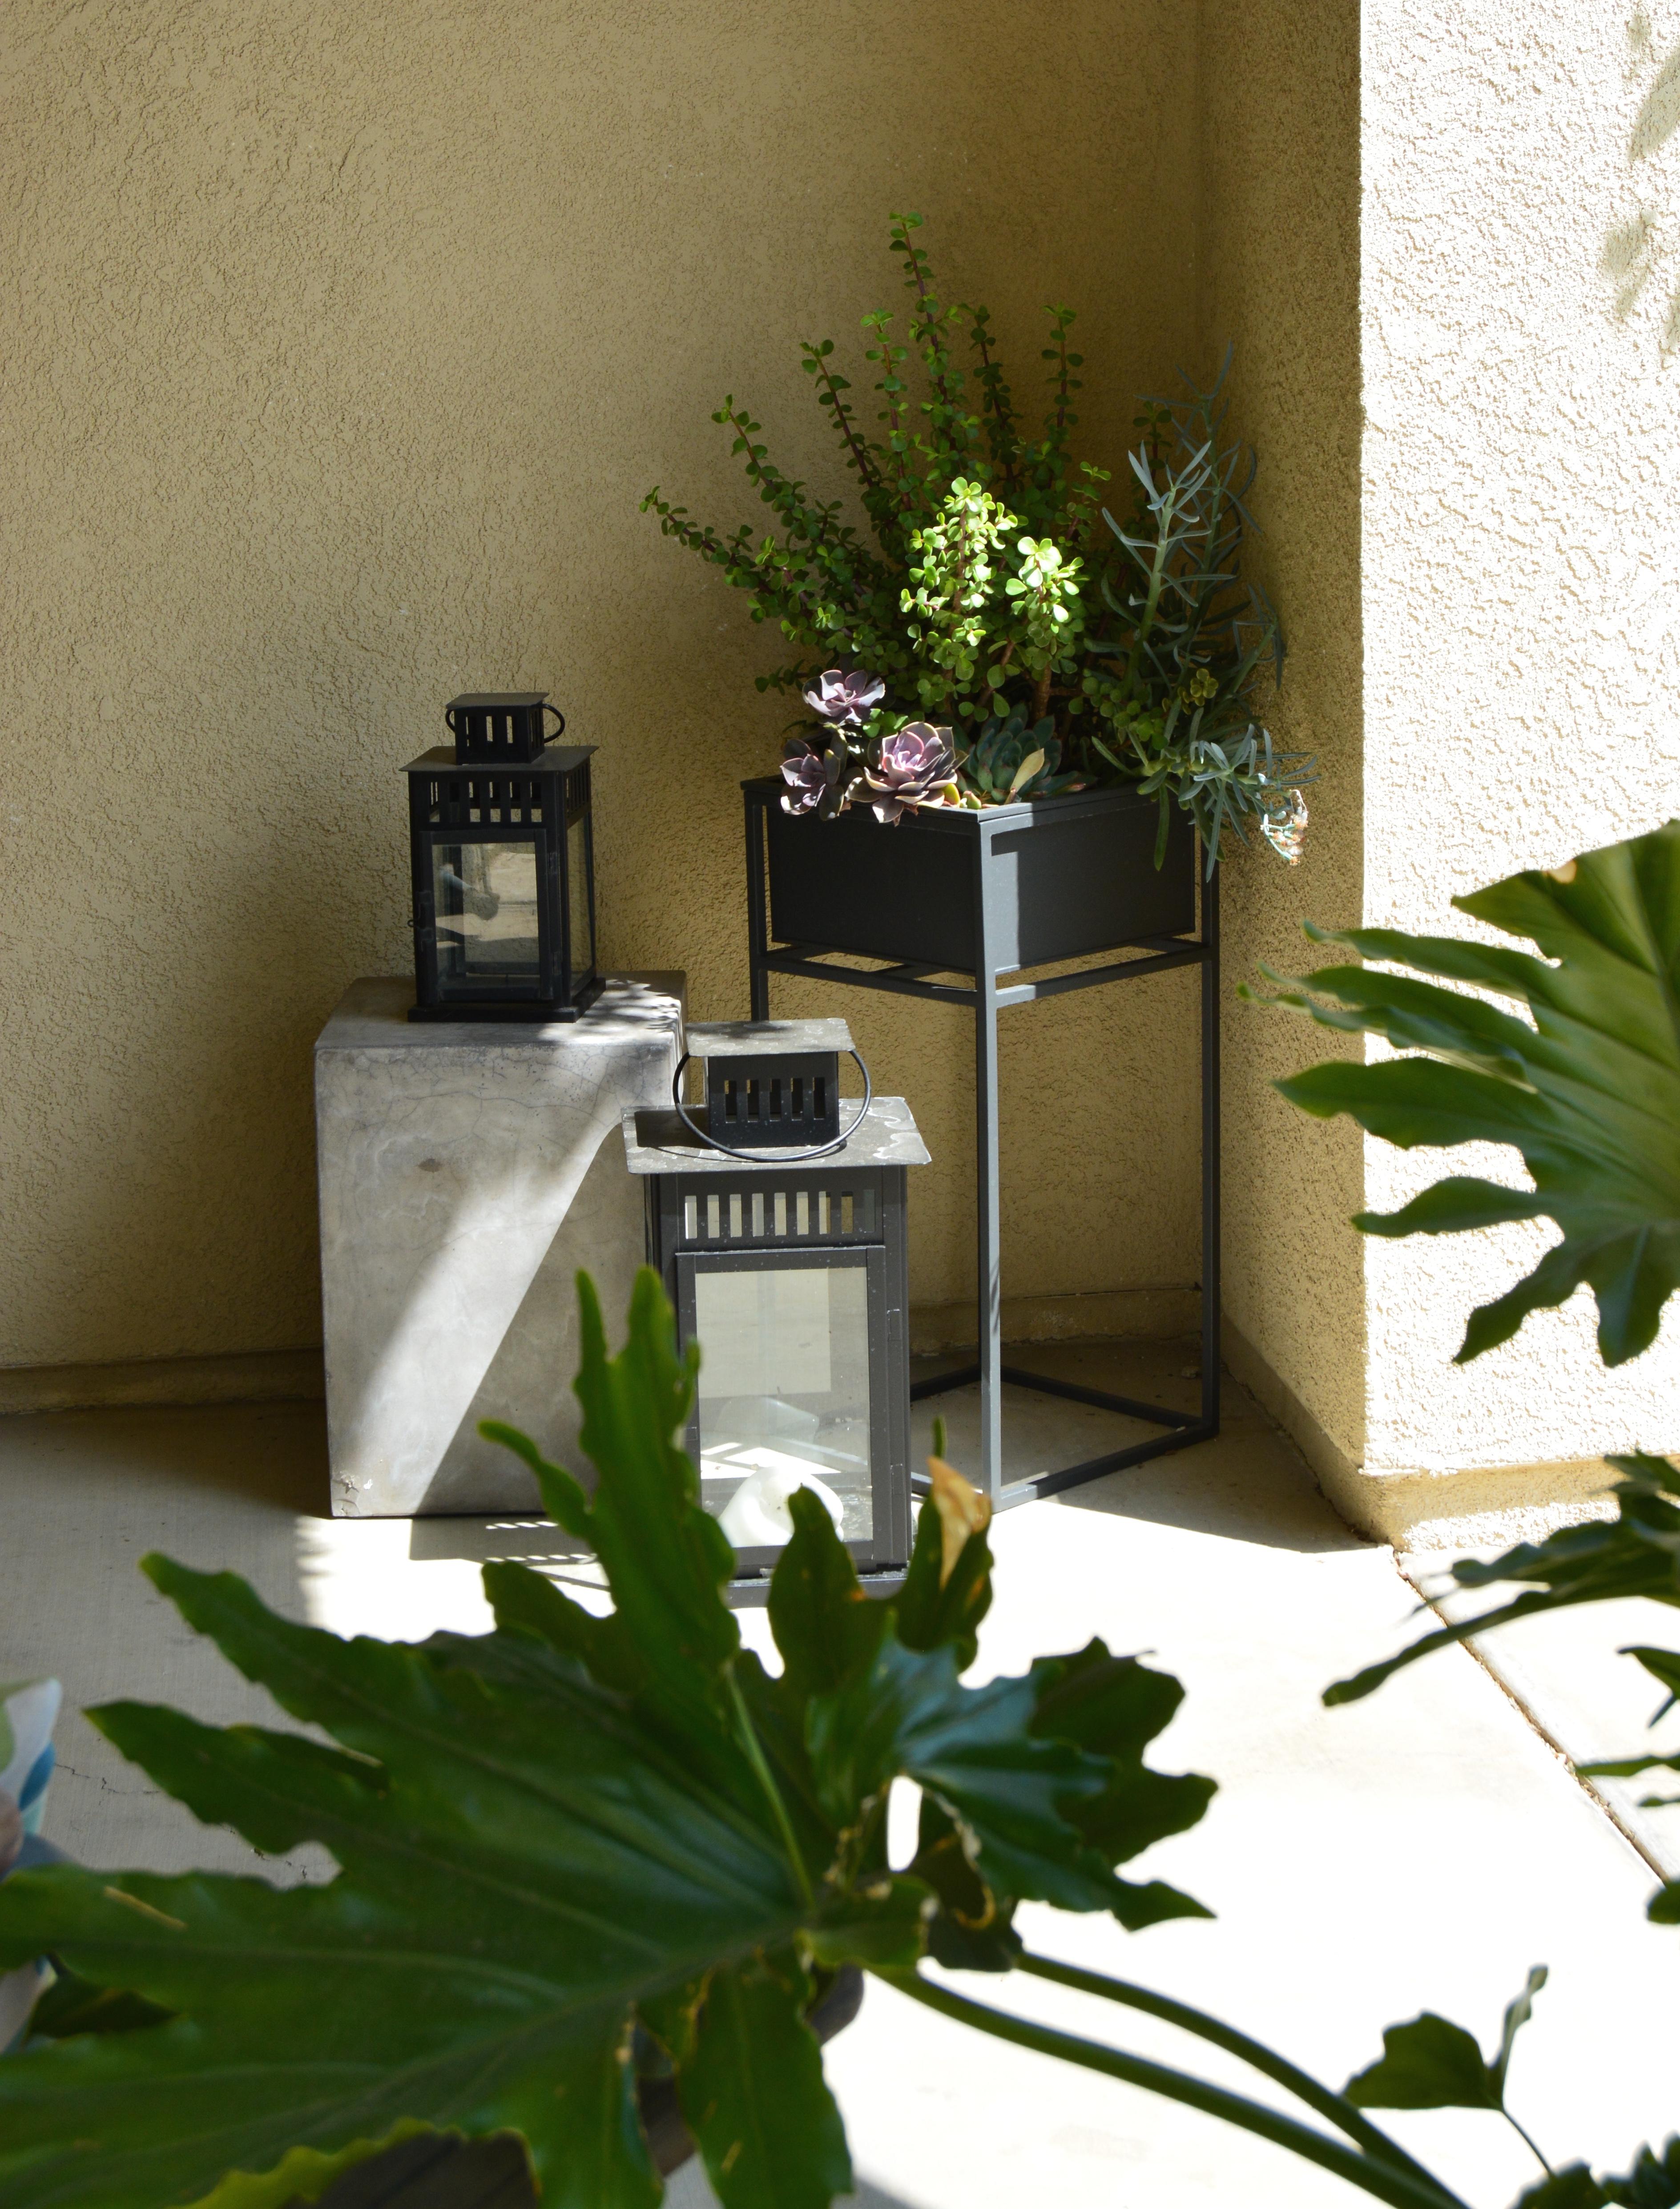 CB2 succulent Planter and lanterns